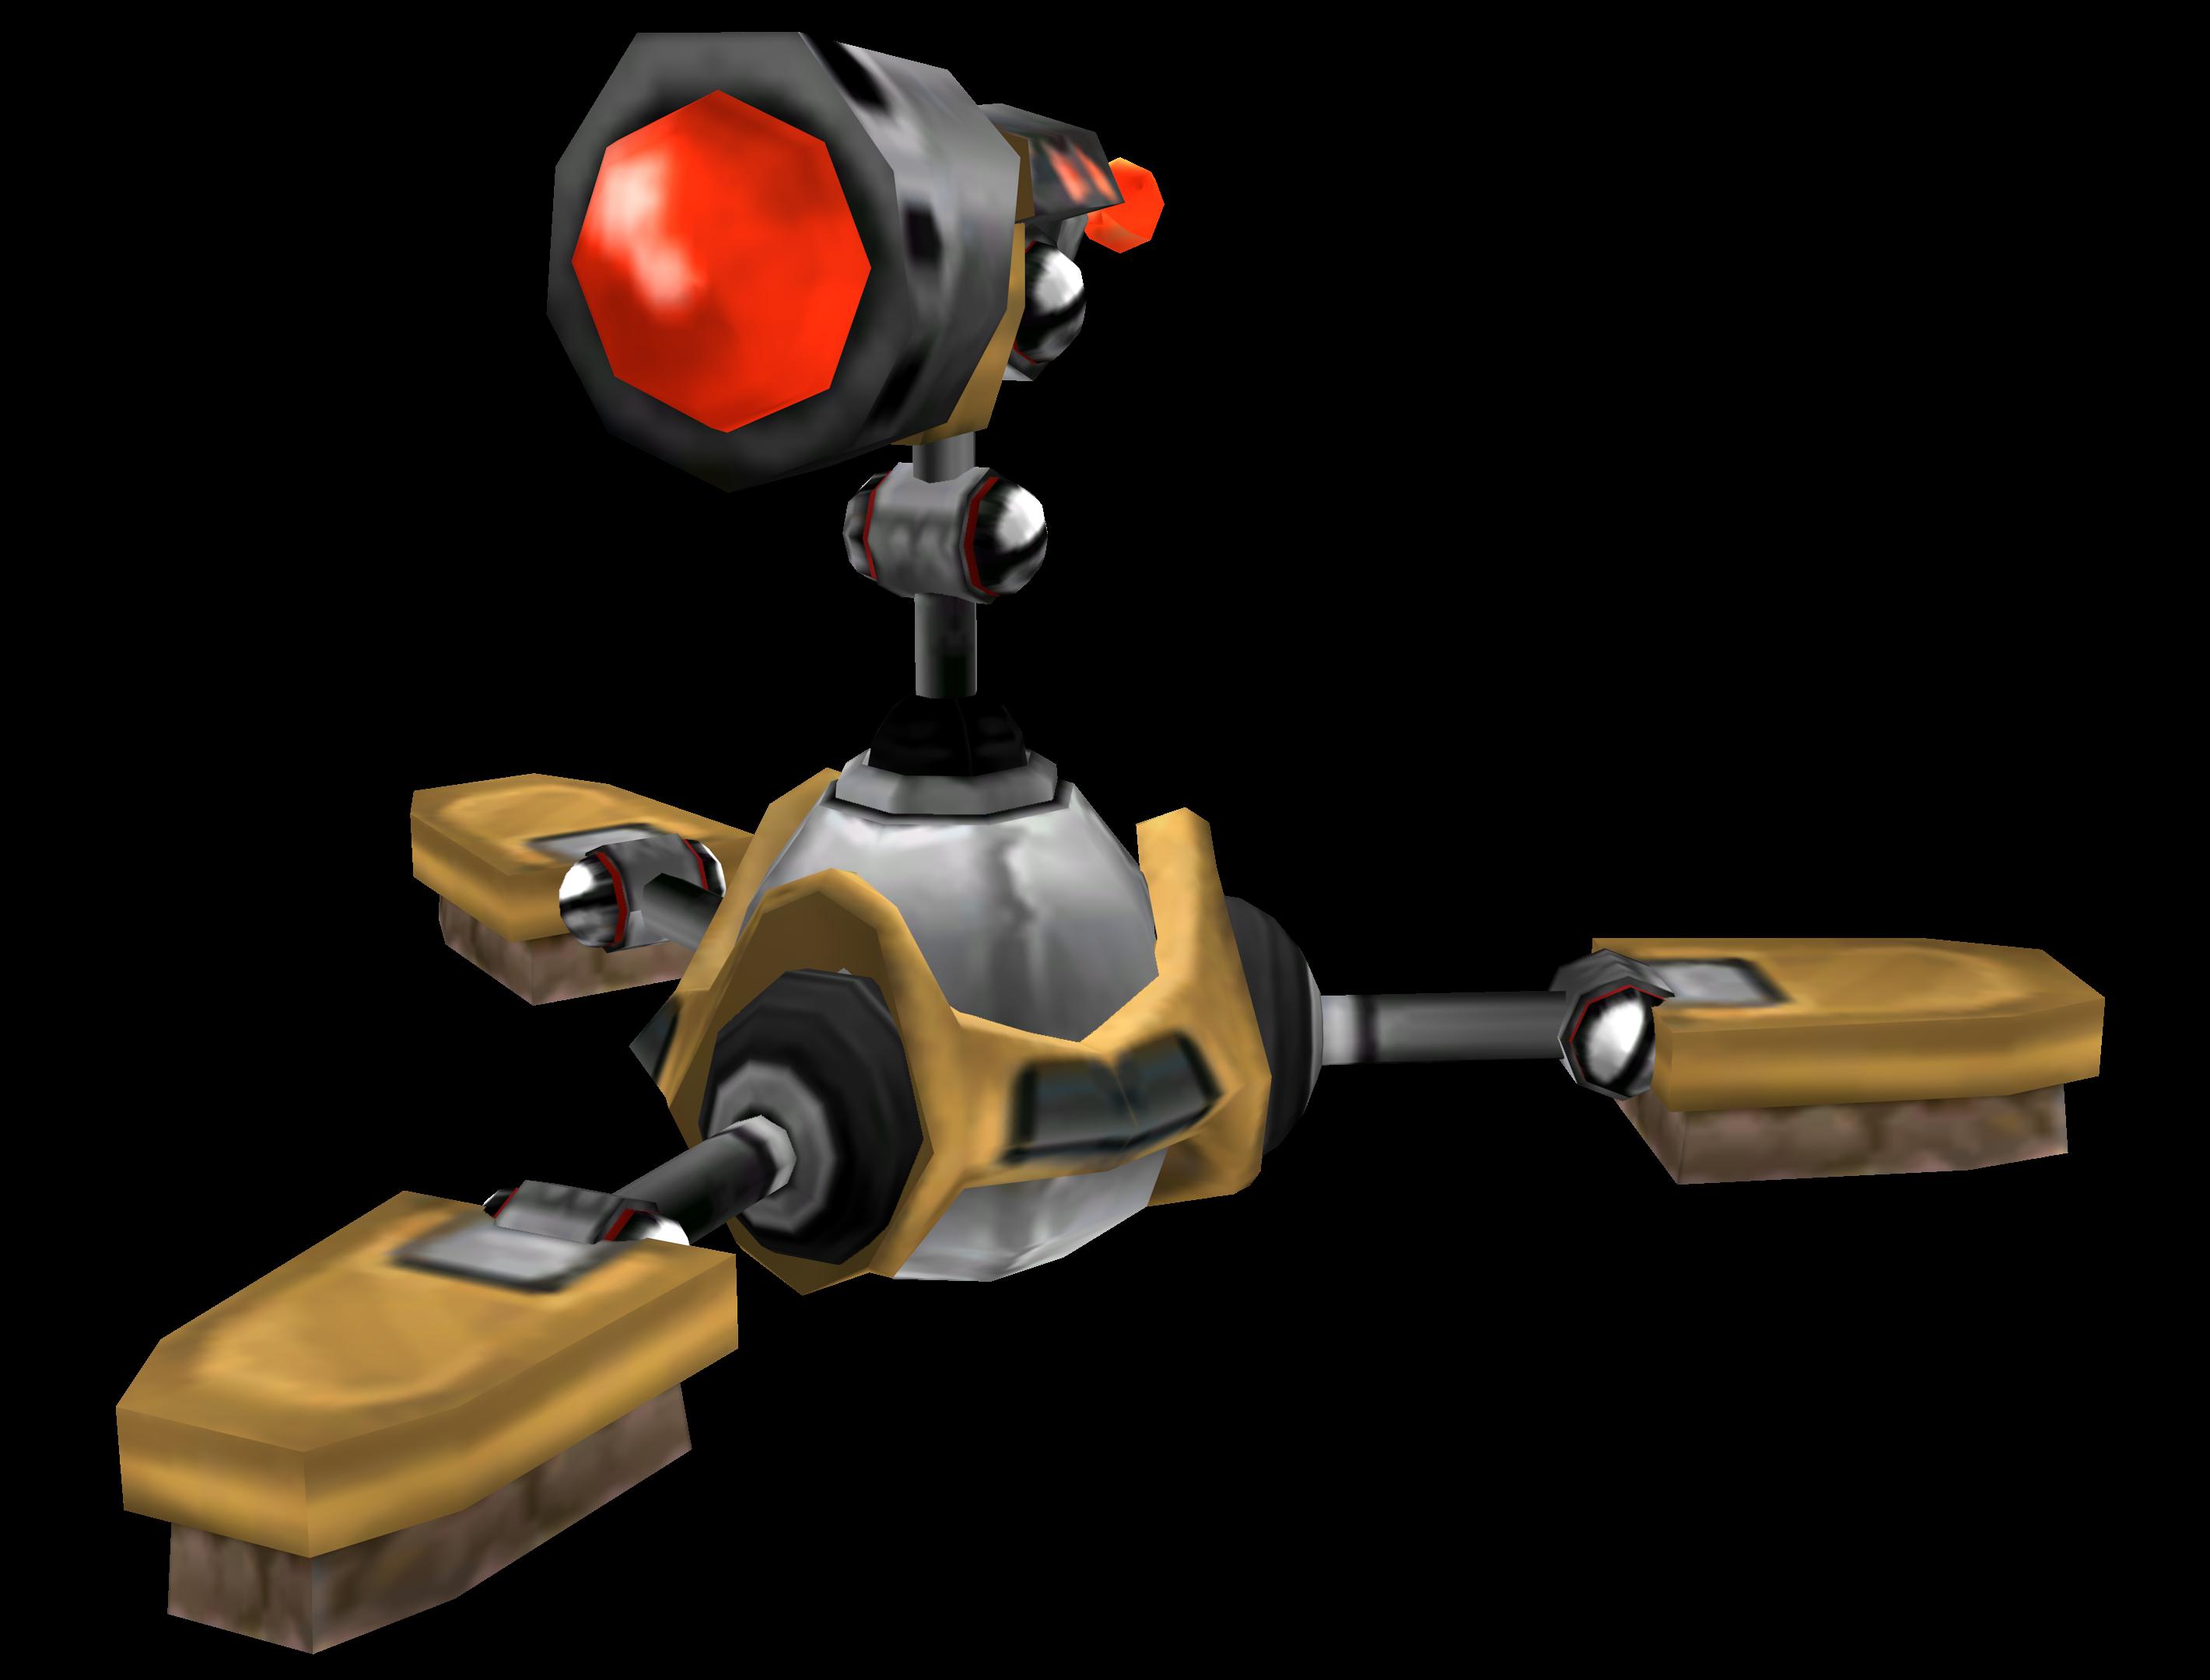 Megacorp Sweeper Bot